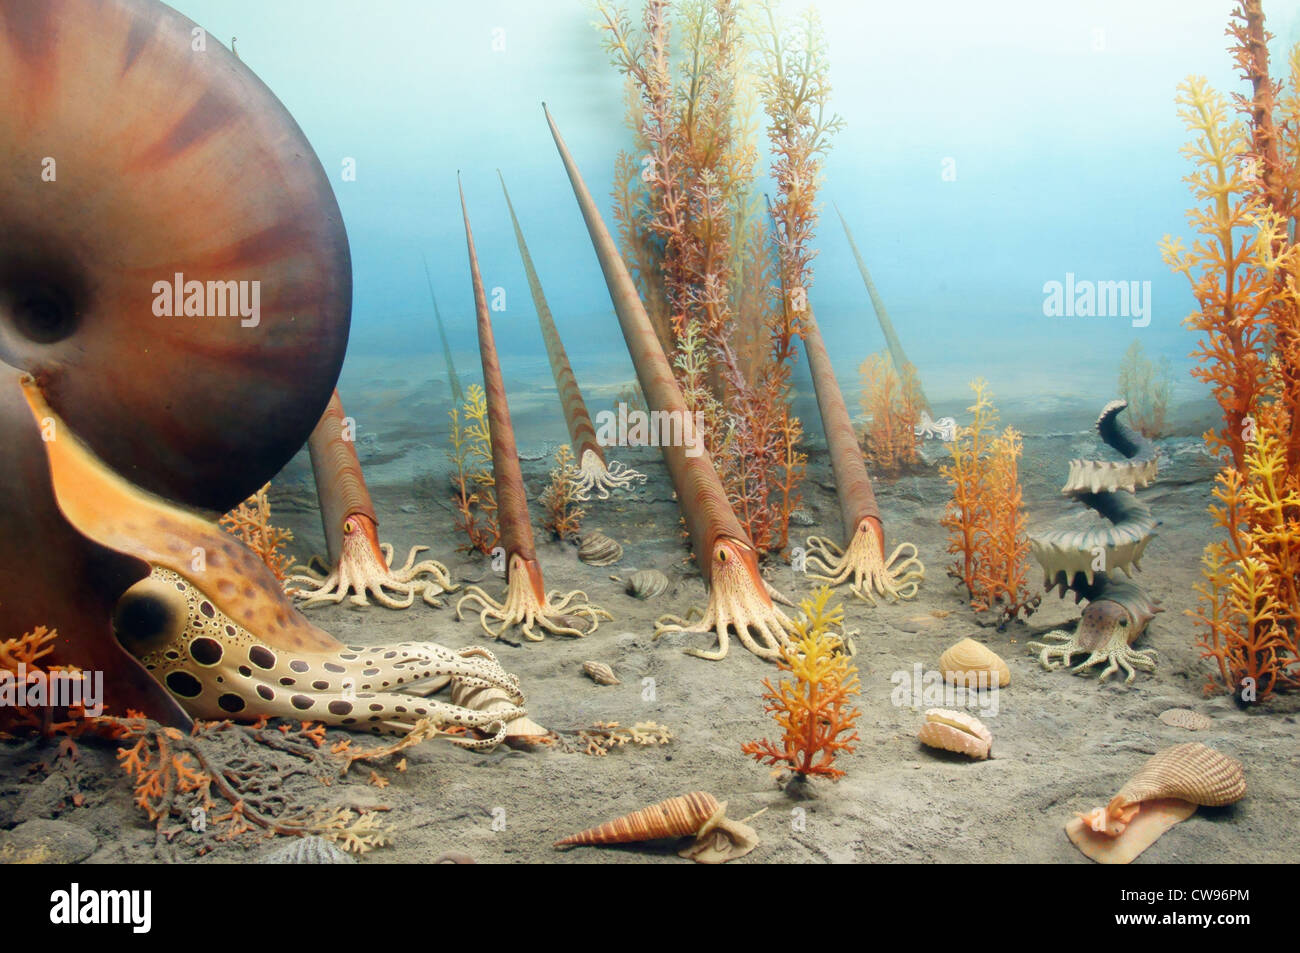 exhibit vegetation wildlife evolution plant plants organisms cretaceous period 144 65 million years ago - Stock Image